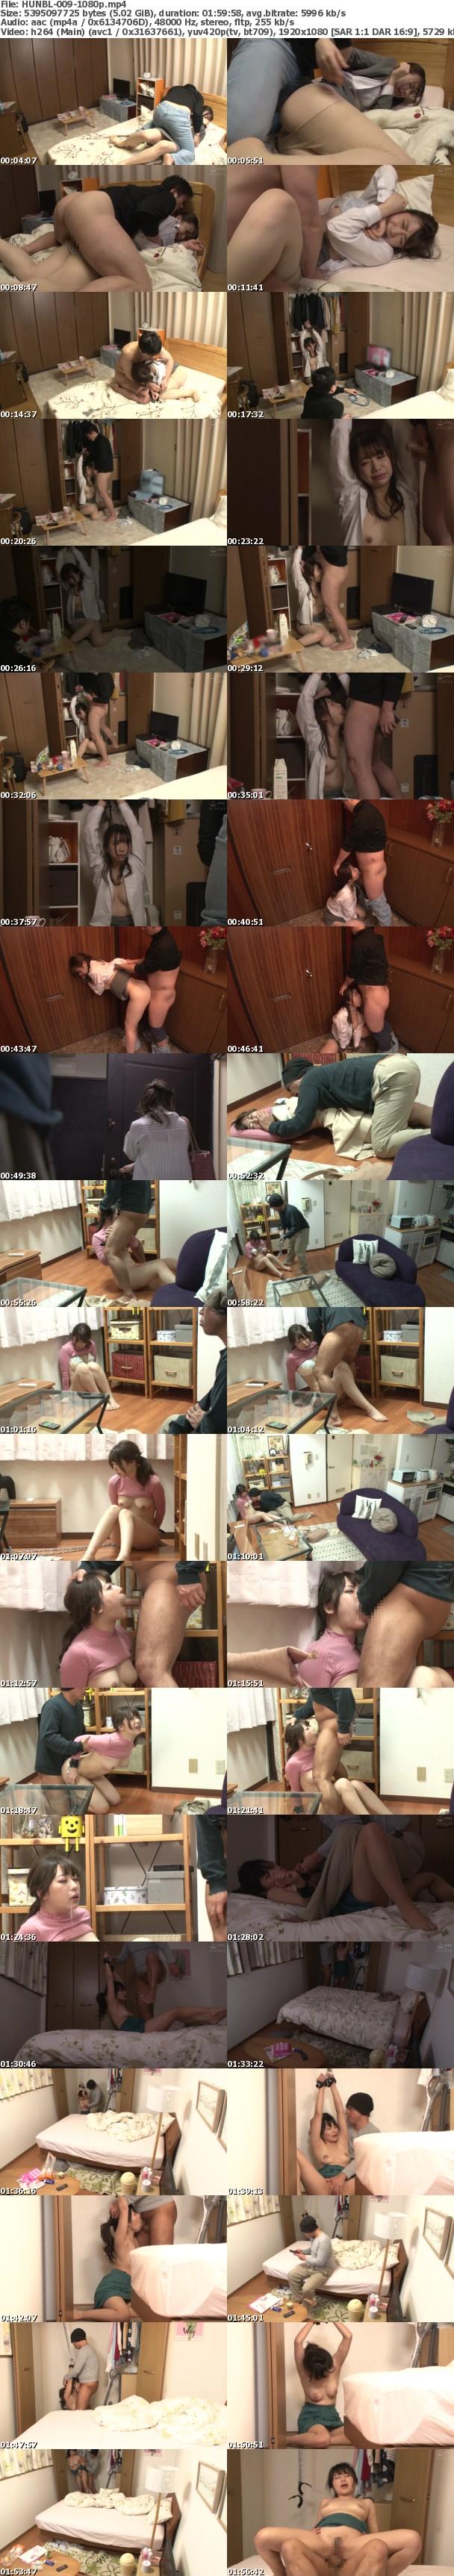 (Full HD) HUNBL-009 自宅押し入り 100時間監禁イラマ漬け